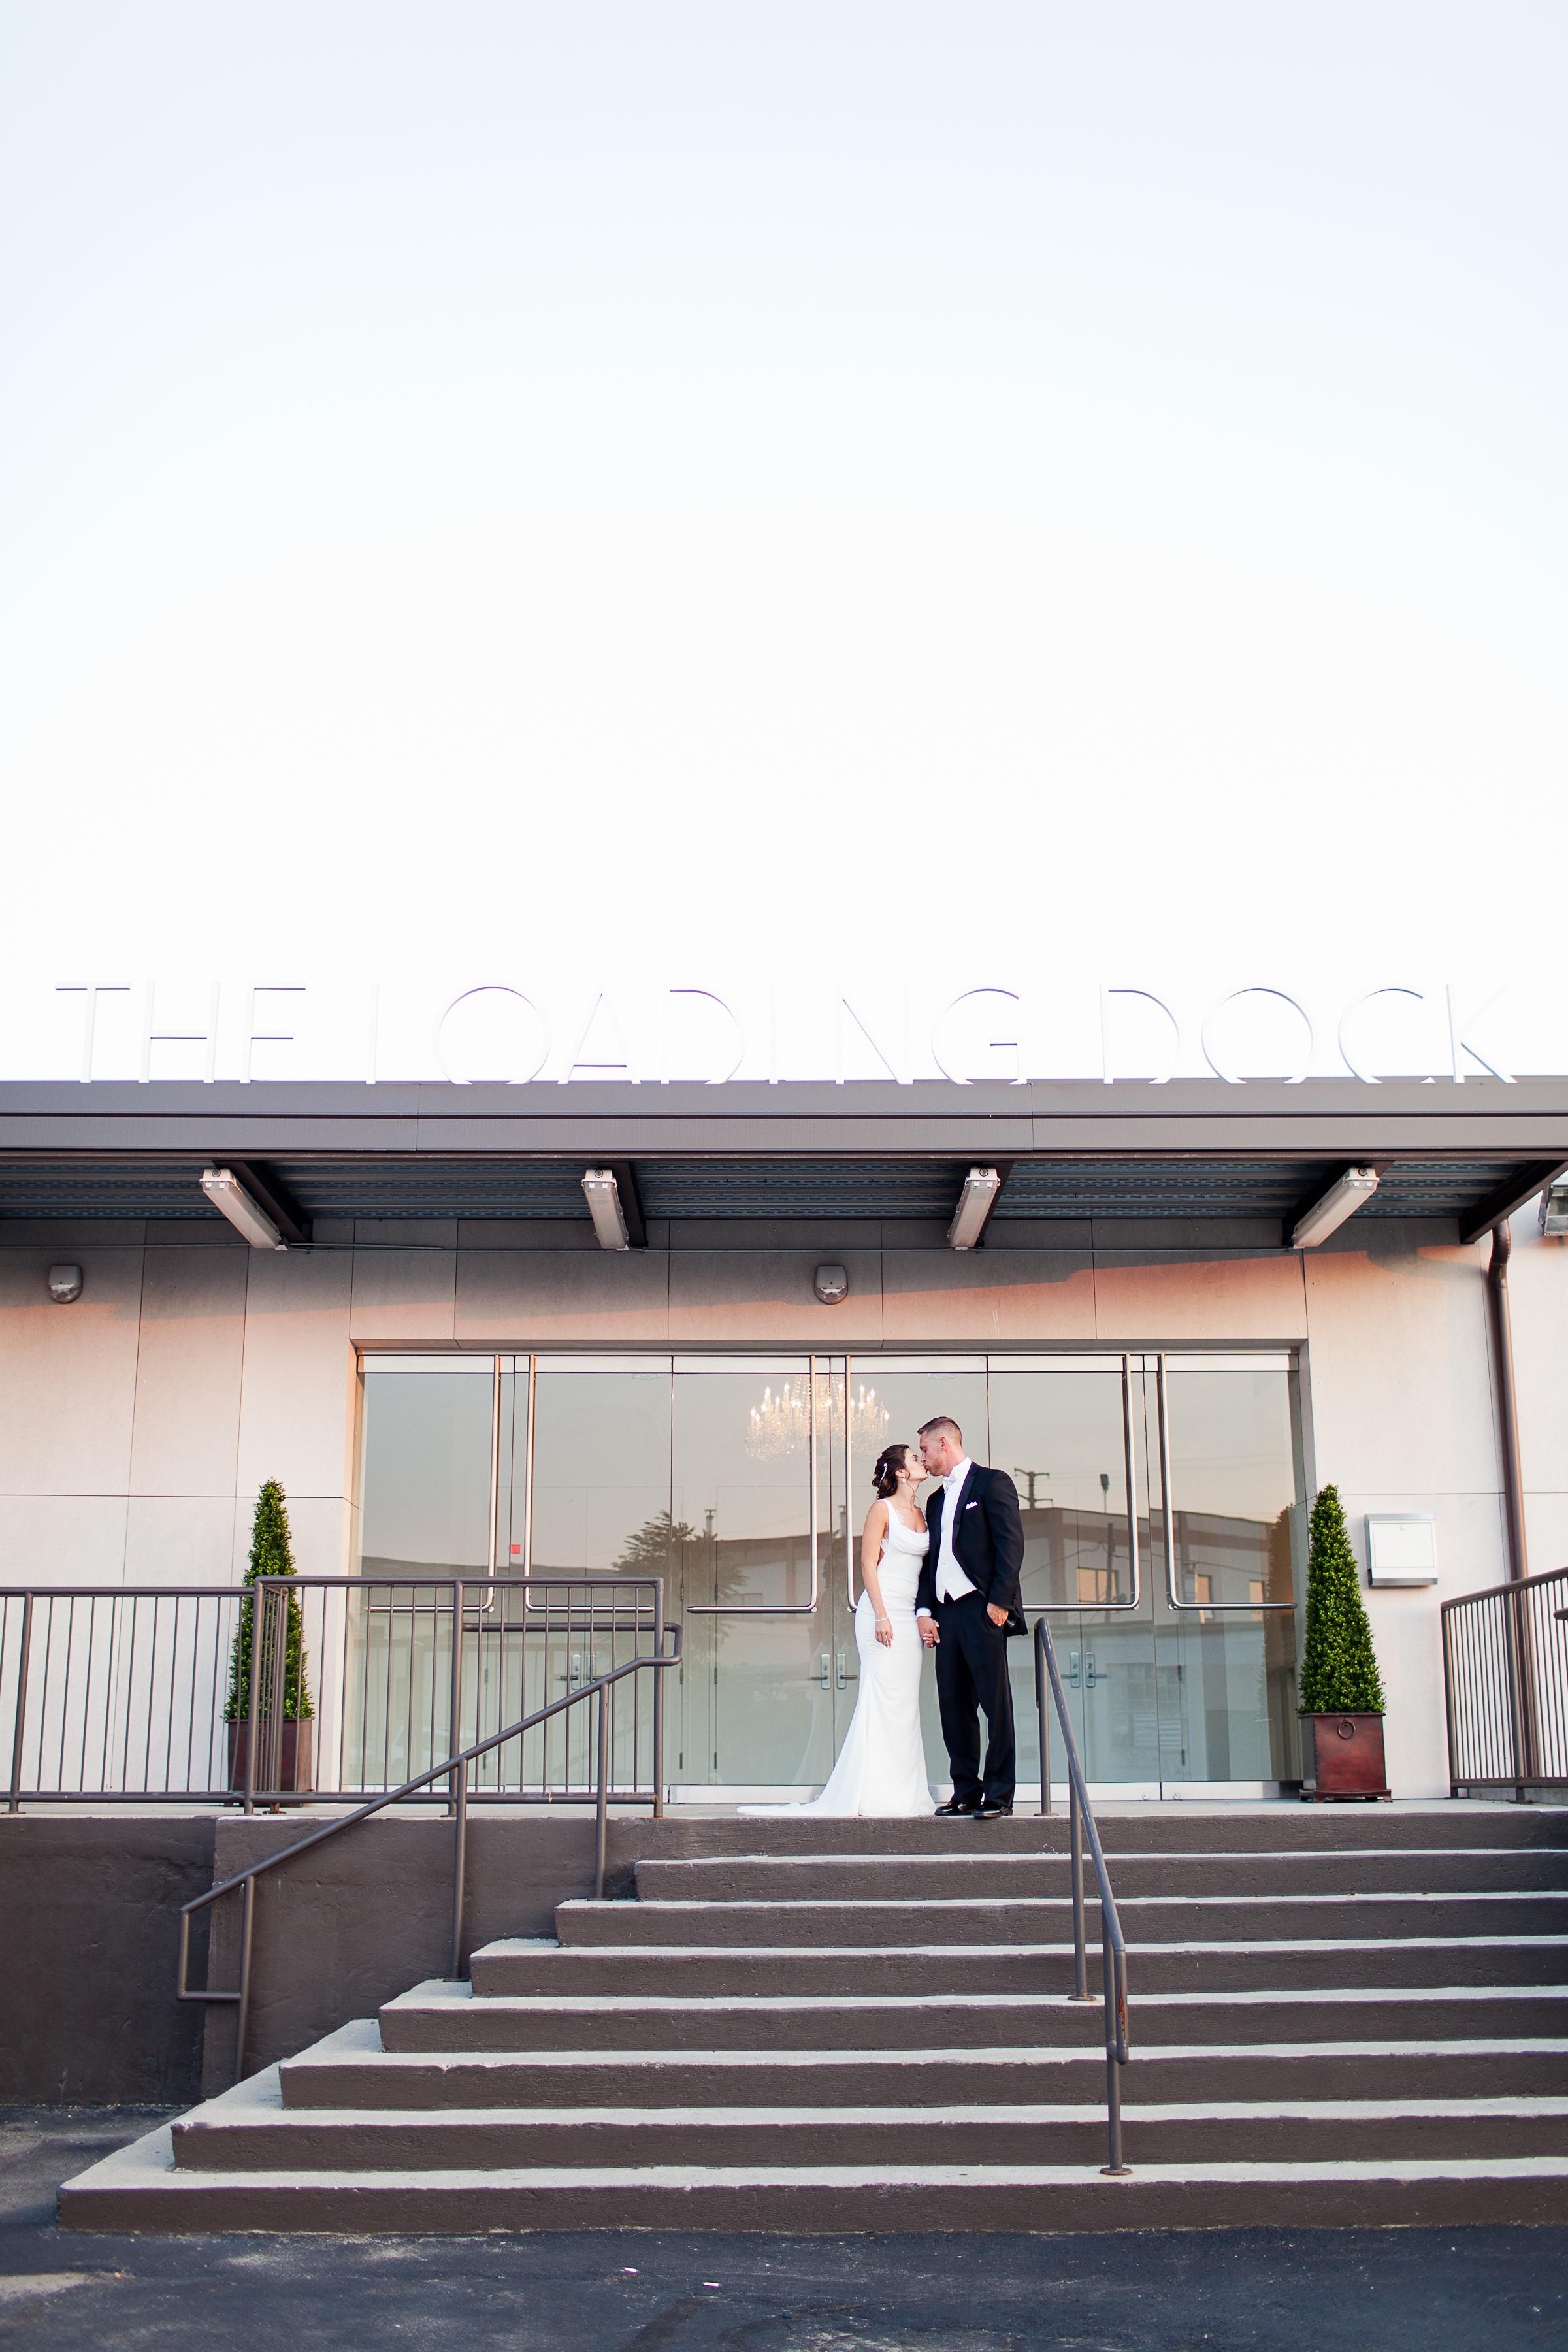 Melissa Kruse Photography - Genna + Anthony The Loading Dock Stamford CT Wedding-773.jpg